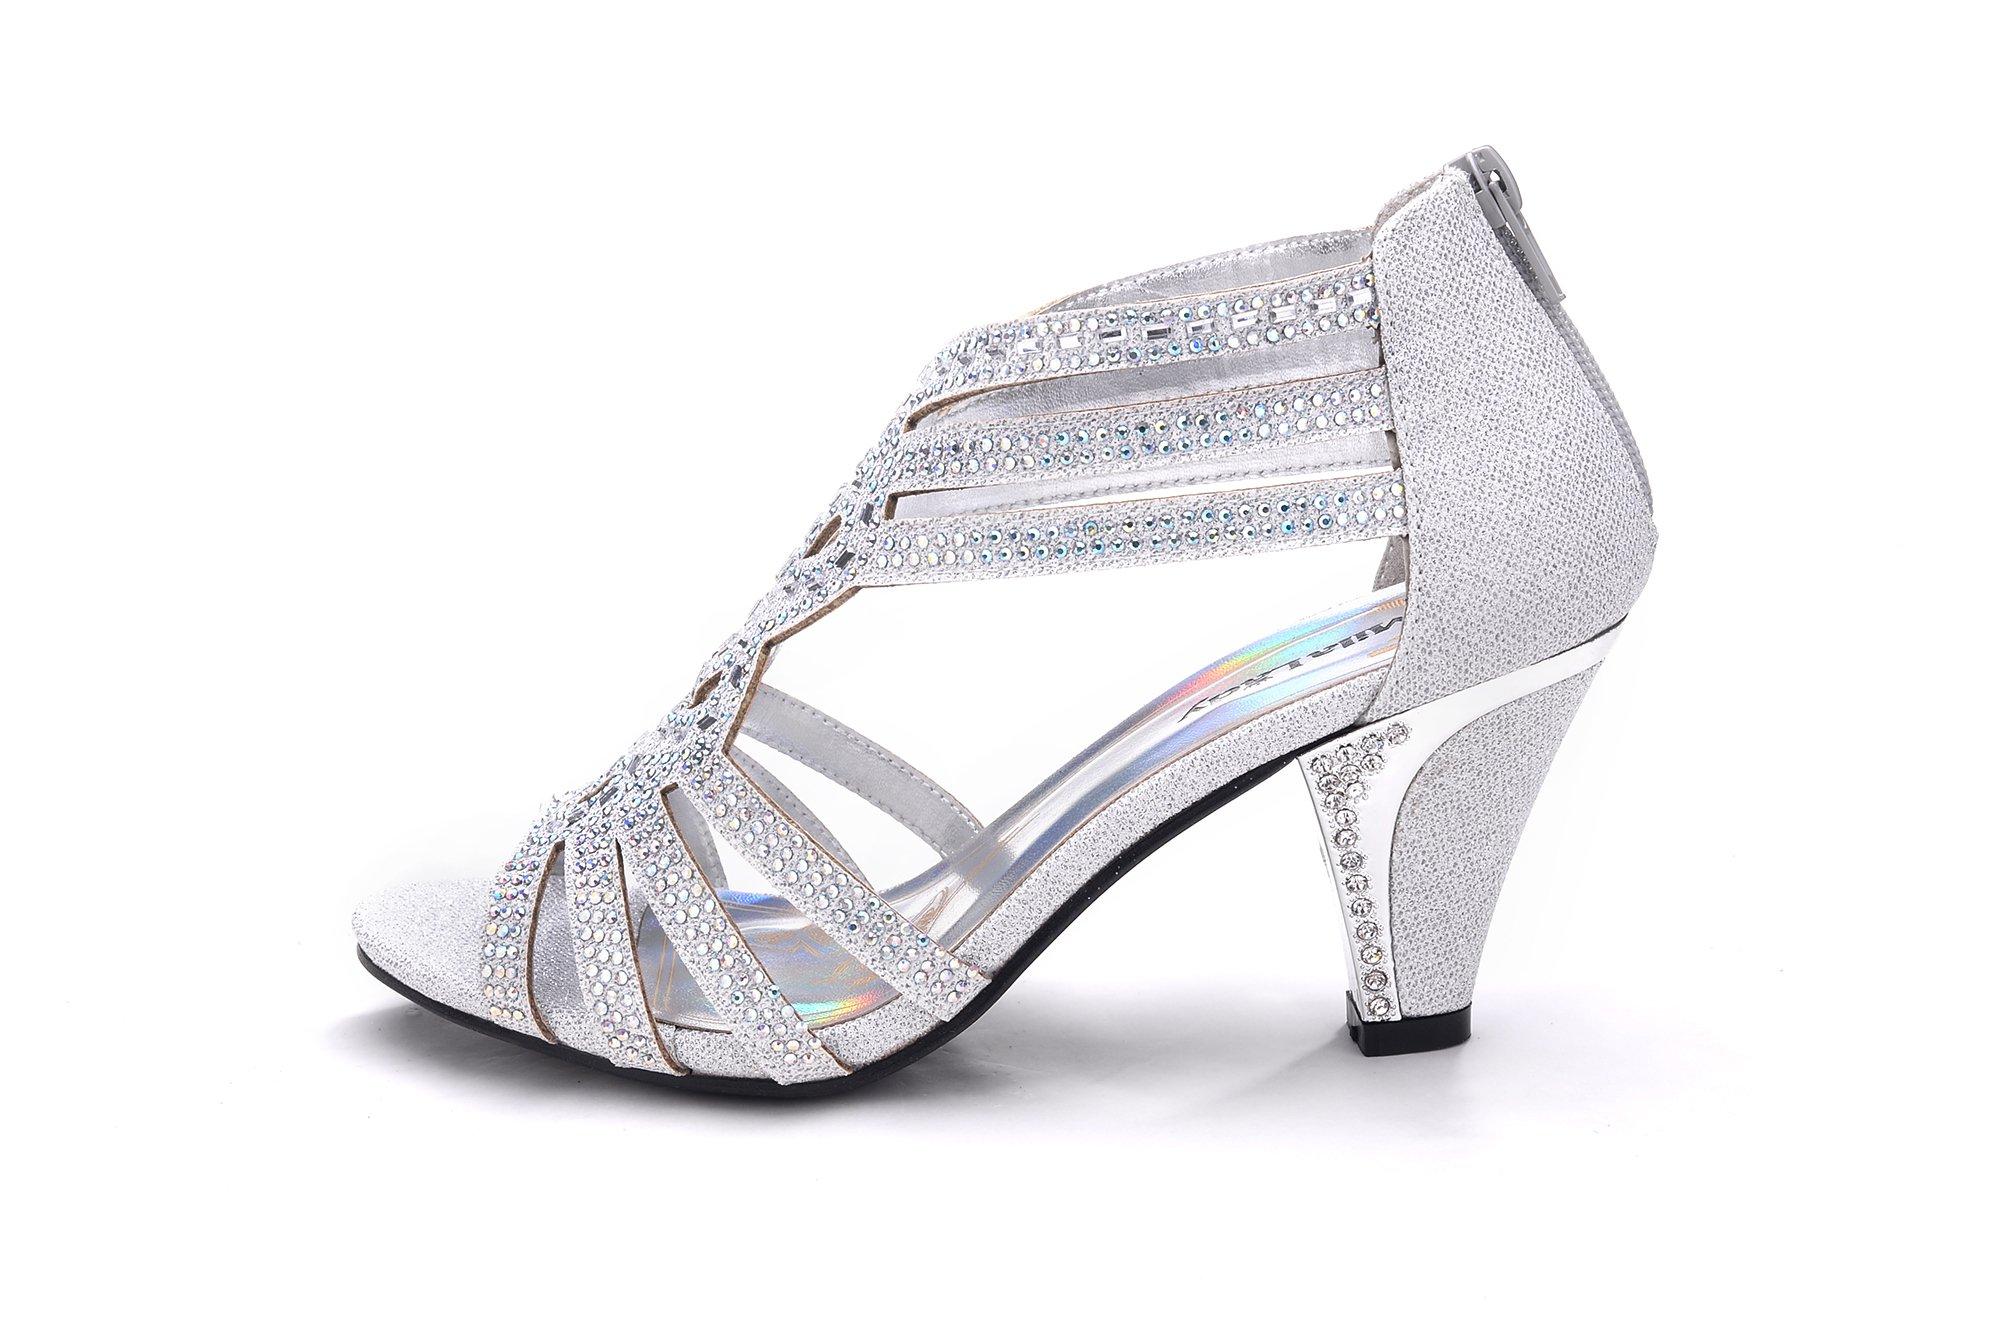 d979ecf20 Mila Lady Women's (kimi25) Lexie Crystal Dress Sandals, Silver 9 ...